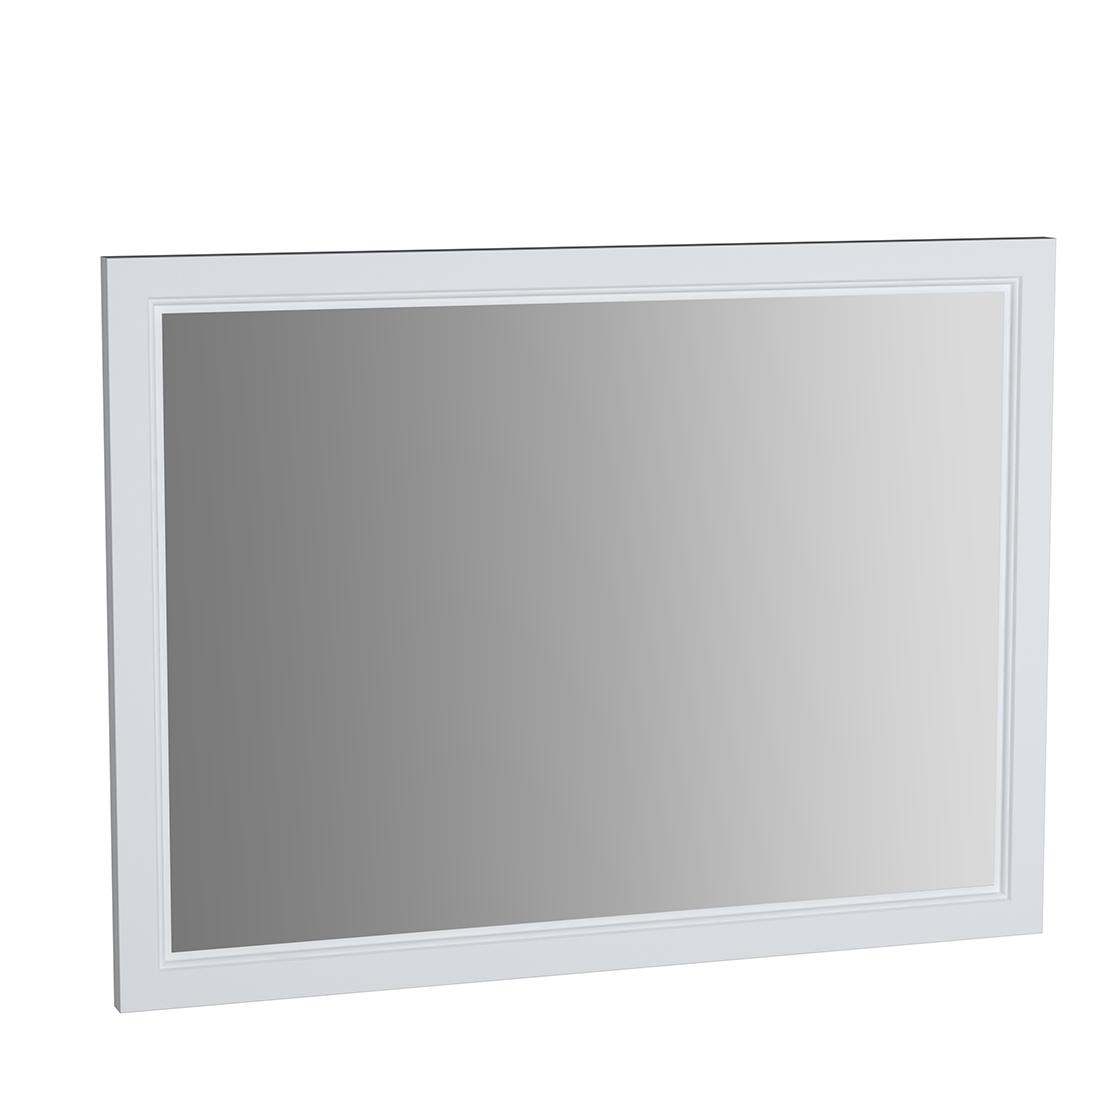 Valarte miroir, 100 cm, blanc mat